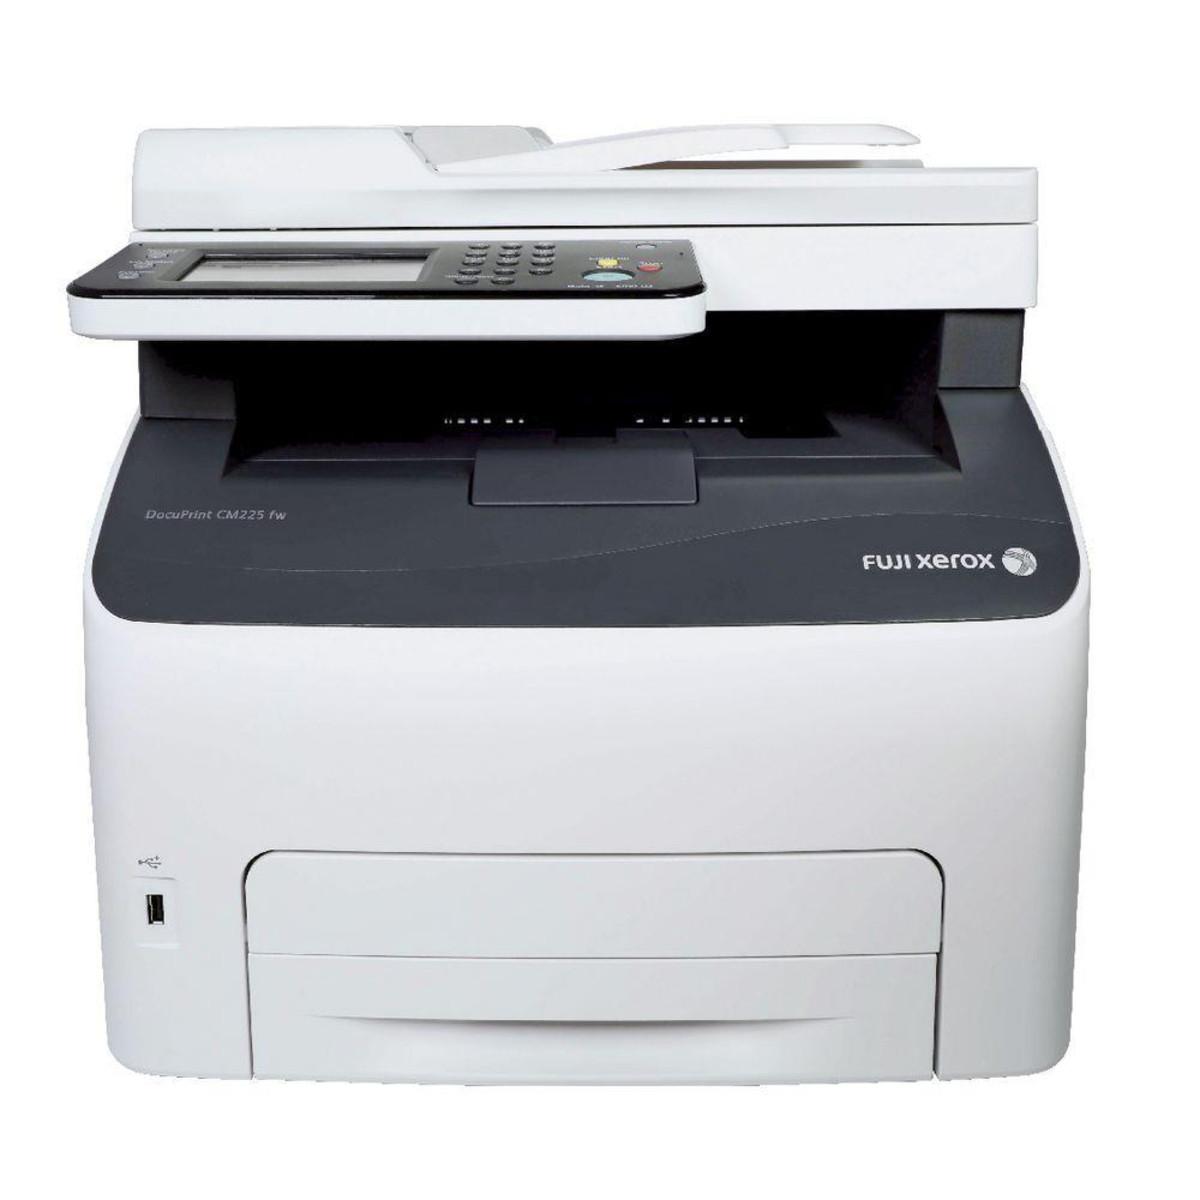 Xerox CM225fw Colour Laser Printer